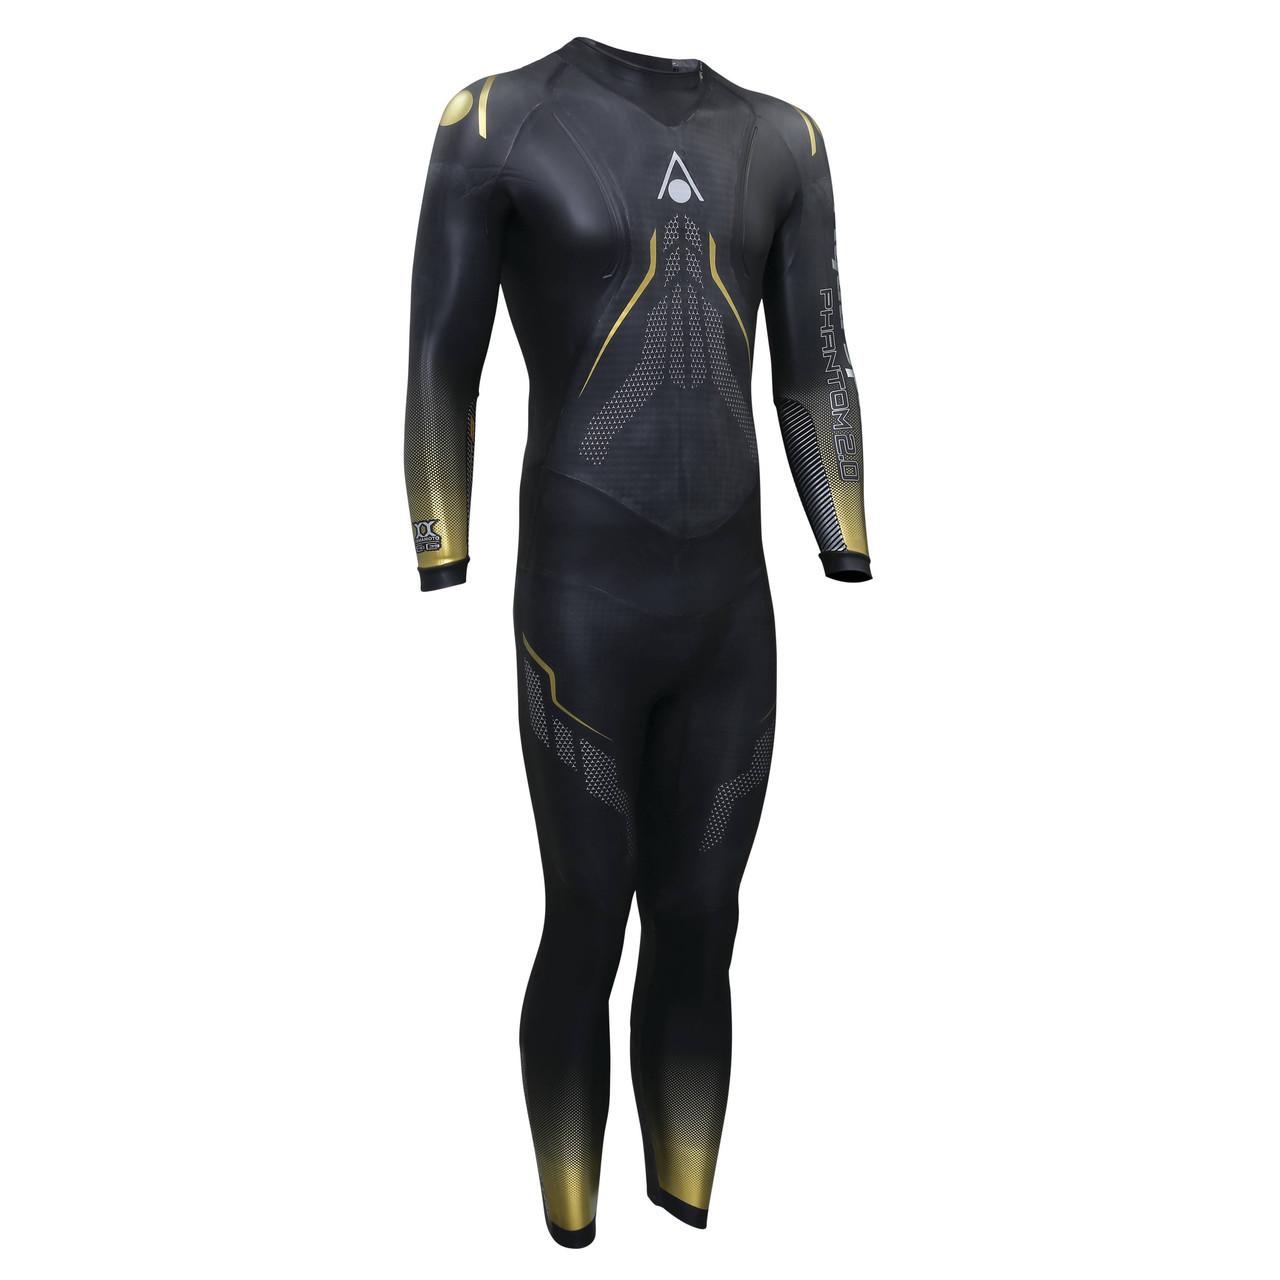 Aqua Sphere Men's Phantom 2.0 Wetsuit - 2019 price